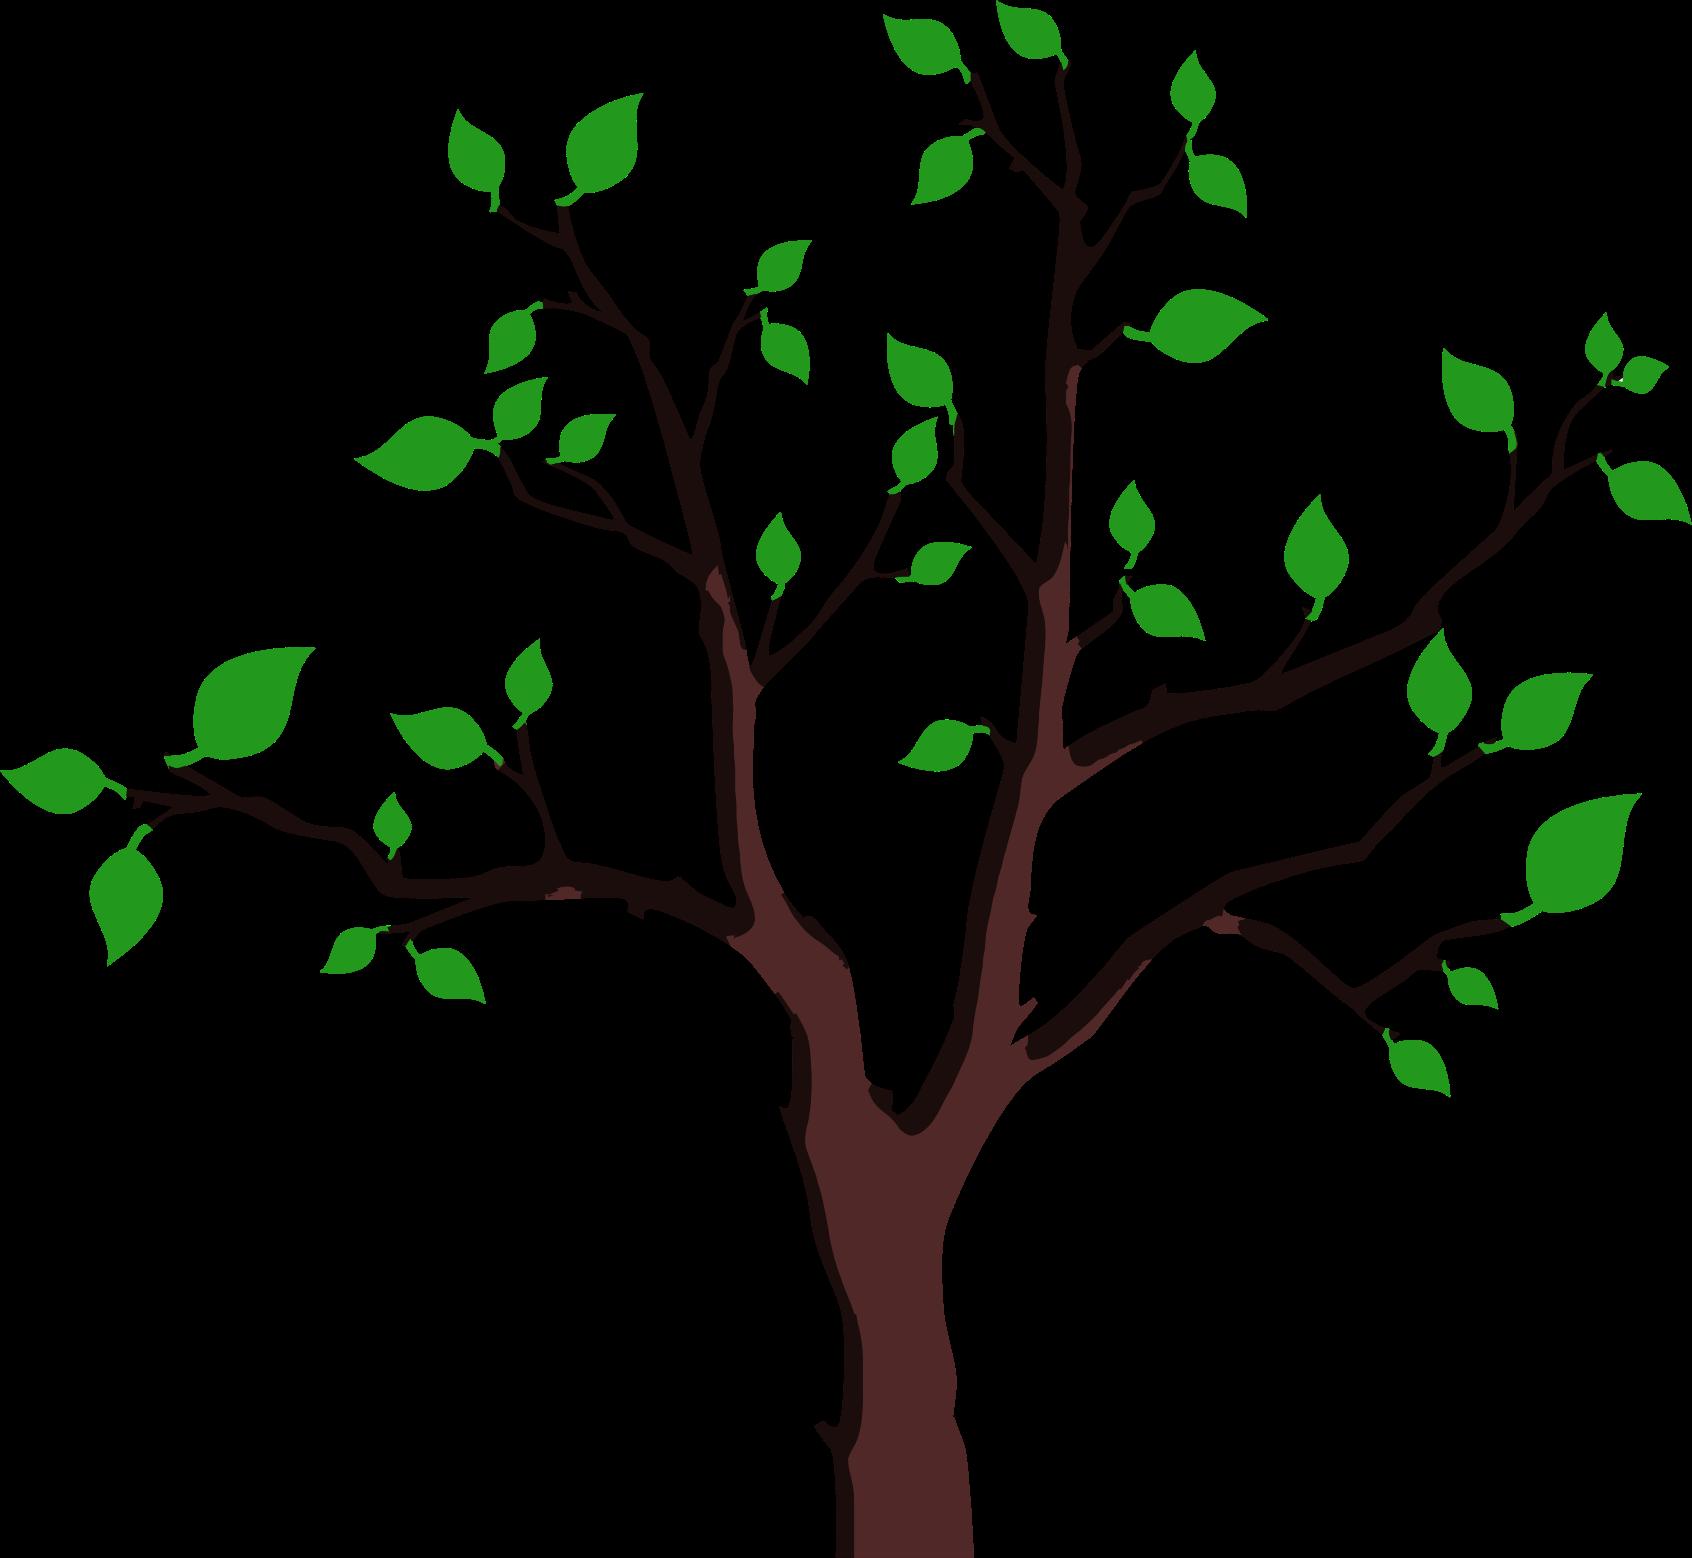 Foliage tree big image. Confetti clipart sparse